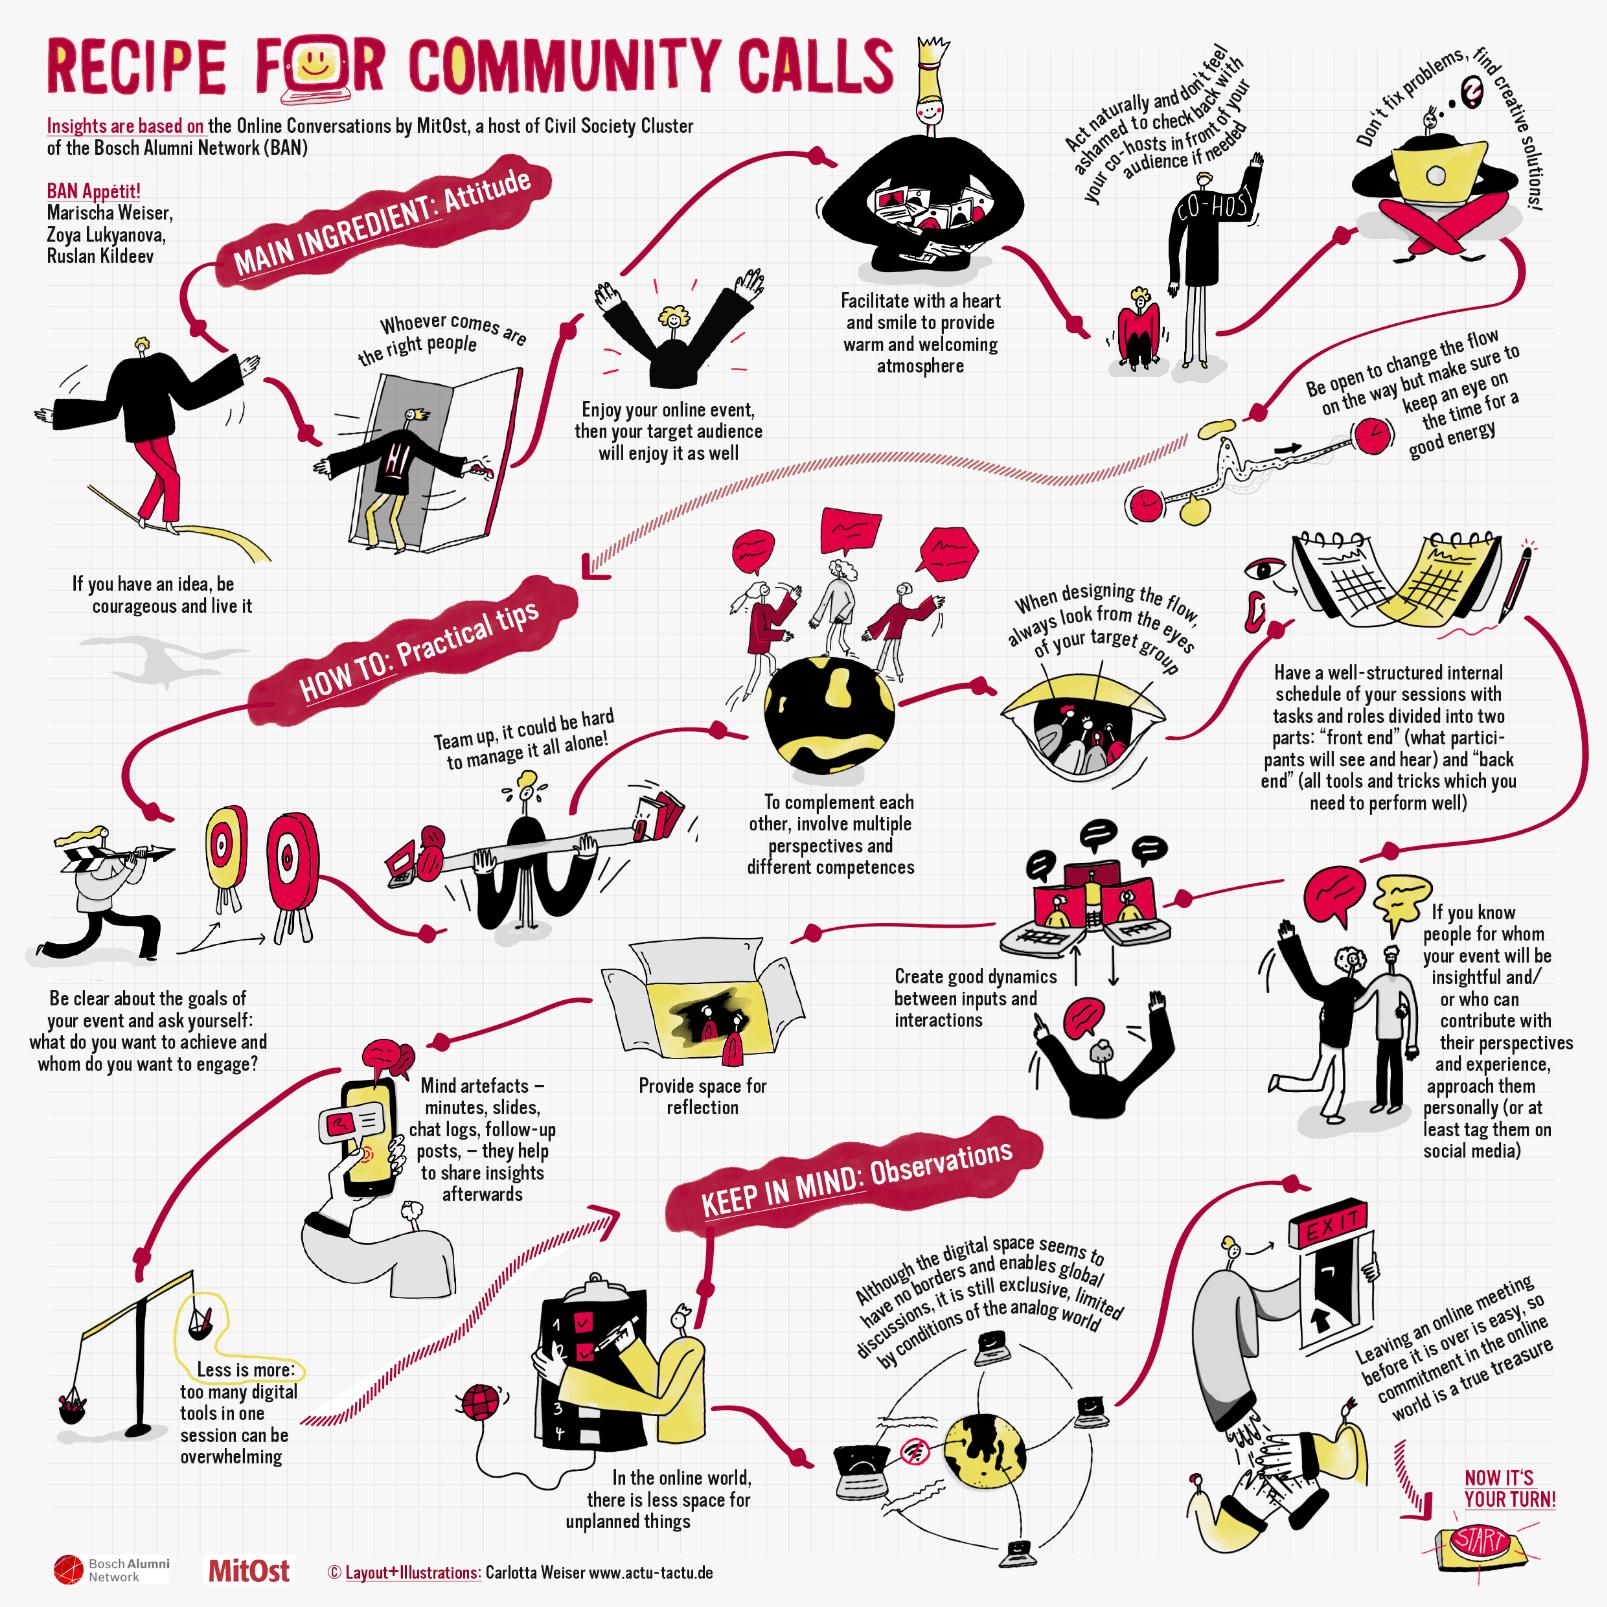 Visualisation - recipe for community calls